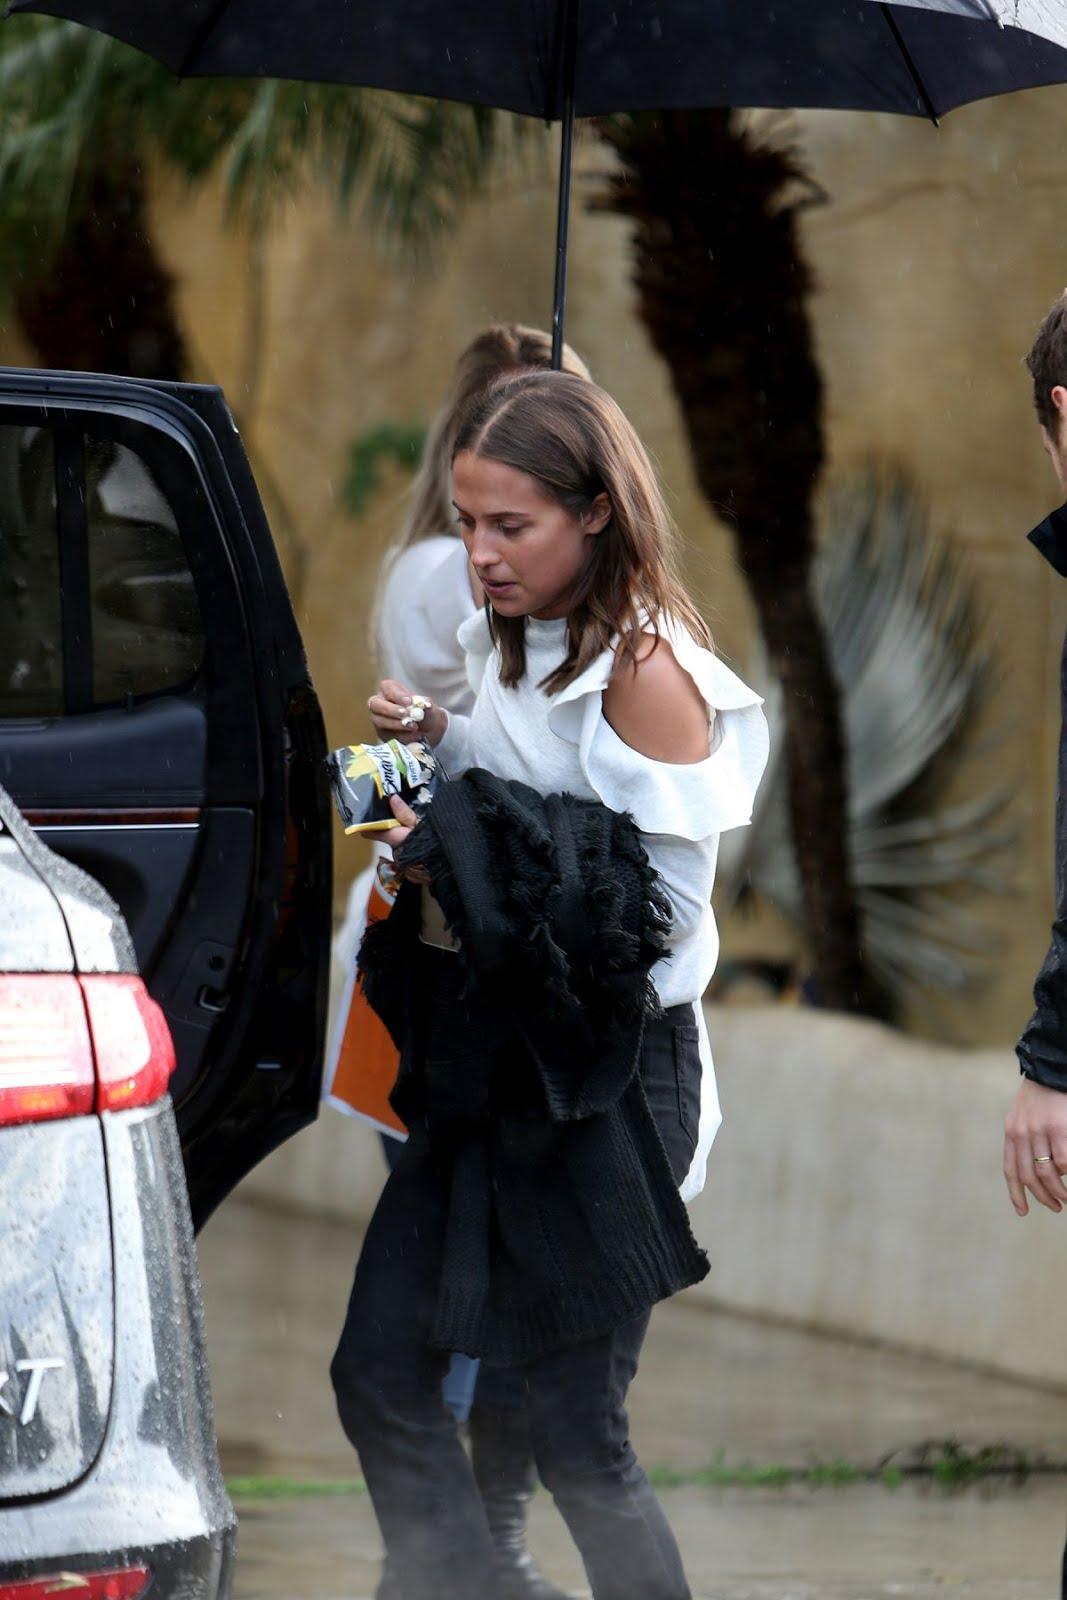 Alicia Vikander leaves her car in heavy rain In Venice Beach